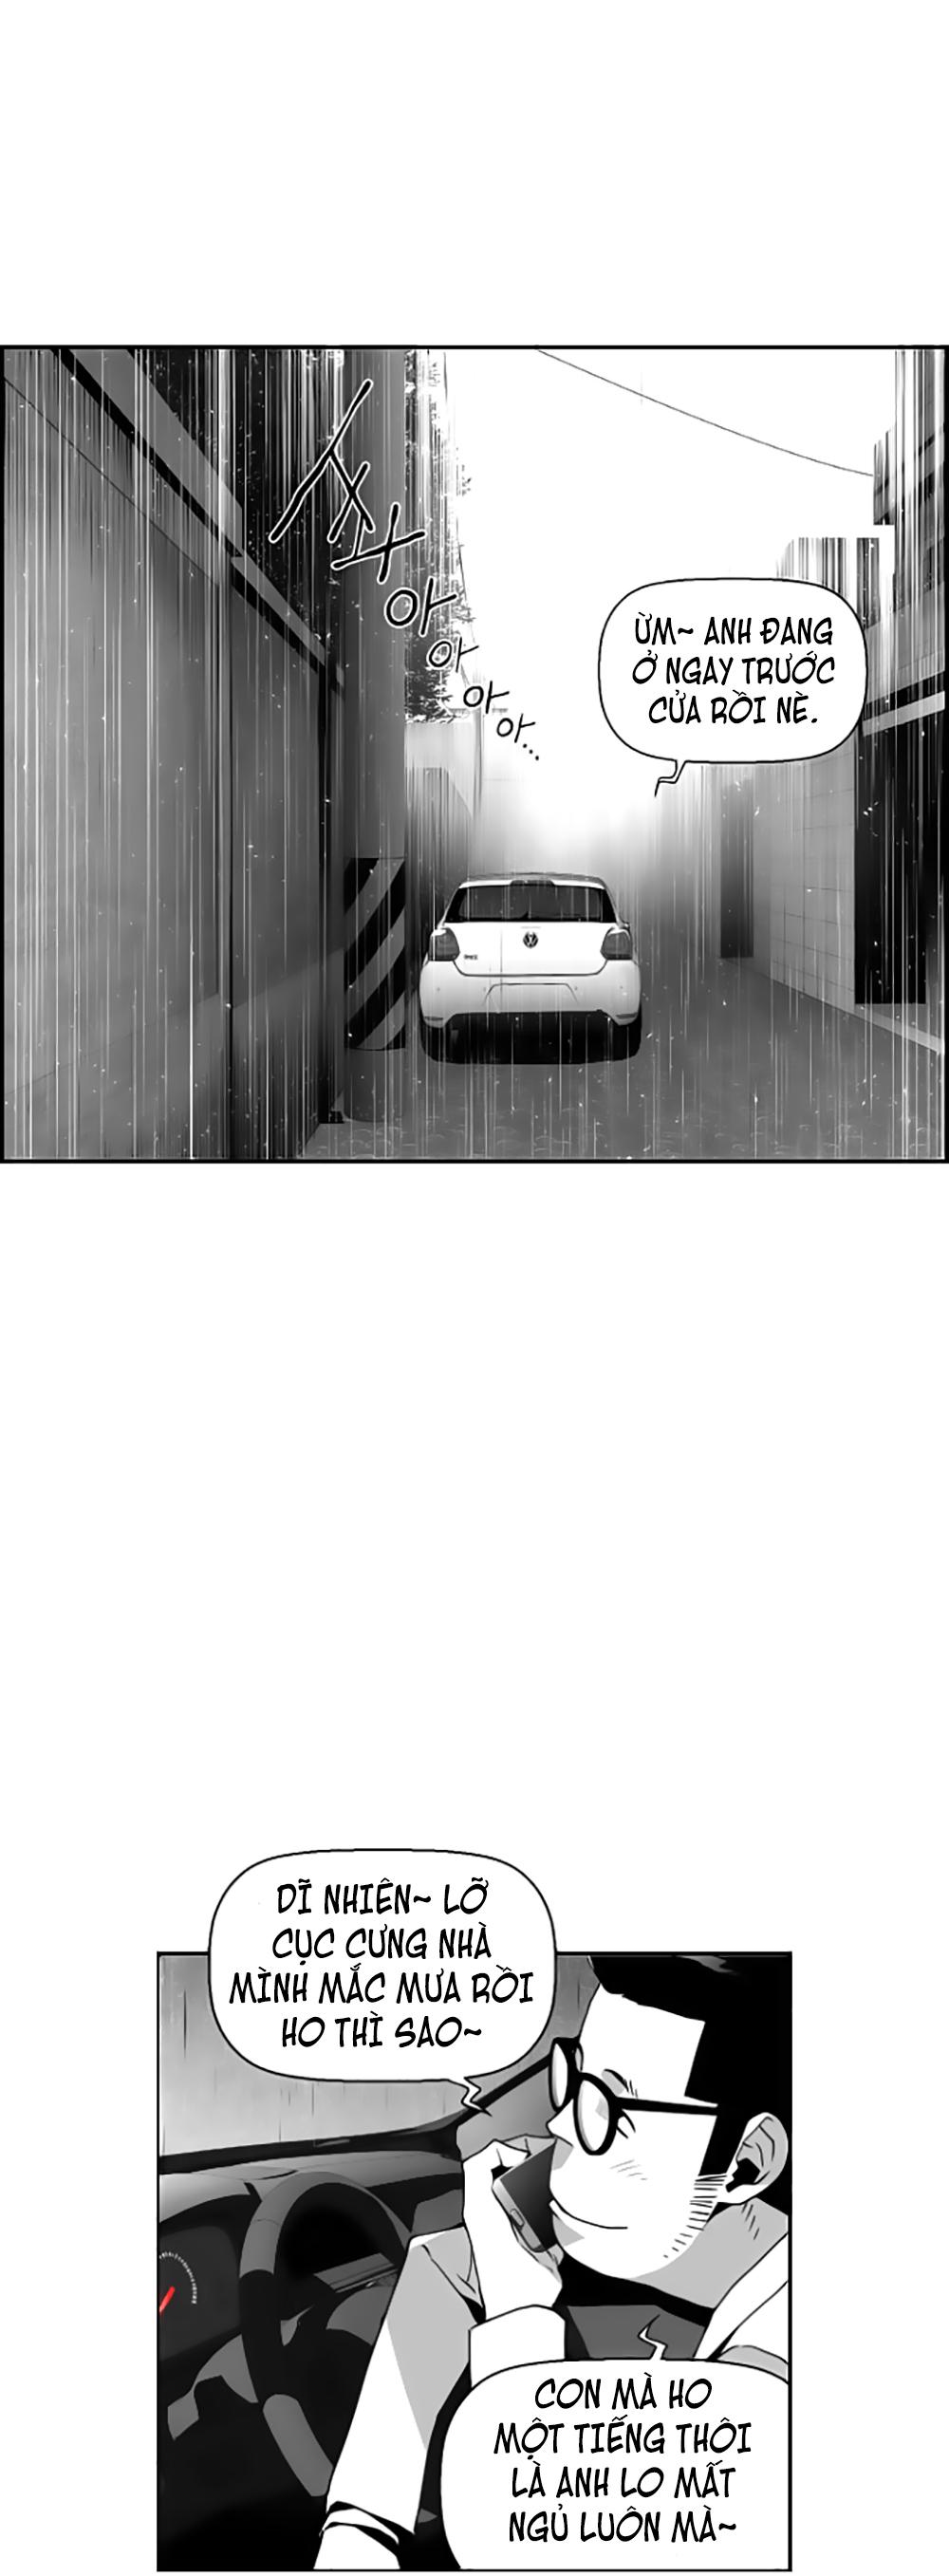 Terror Man - Kẻ Khủng Bố Chapter 48 - Hamtruyen.vn